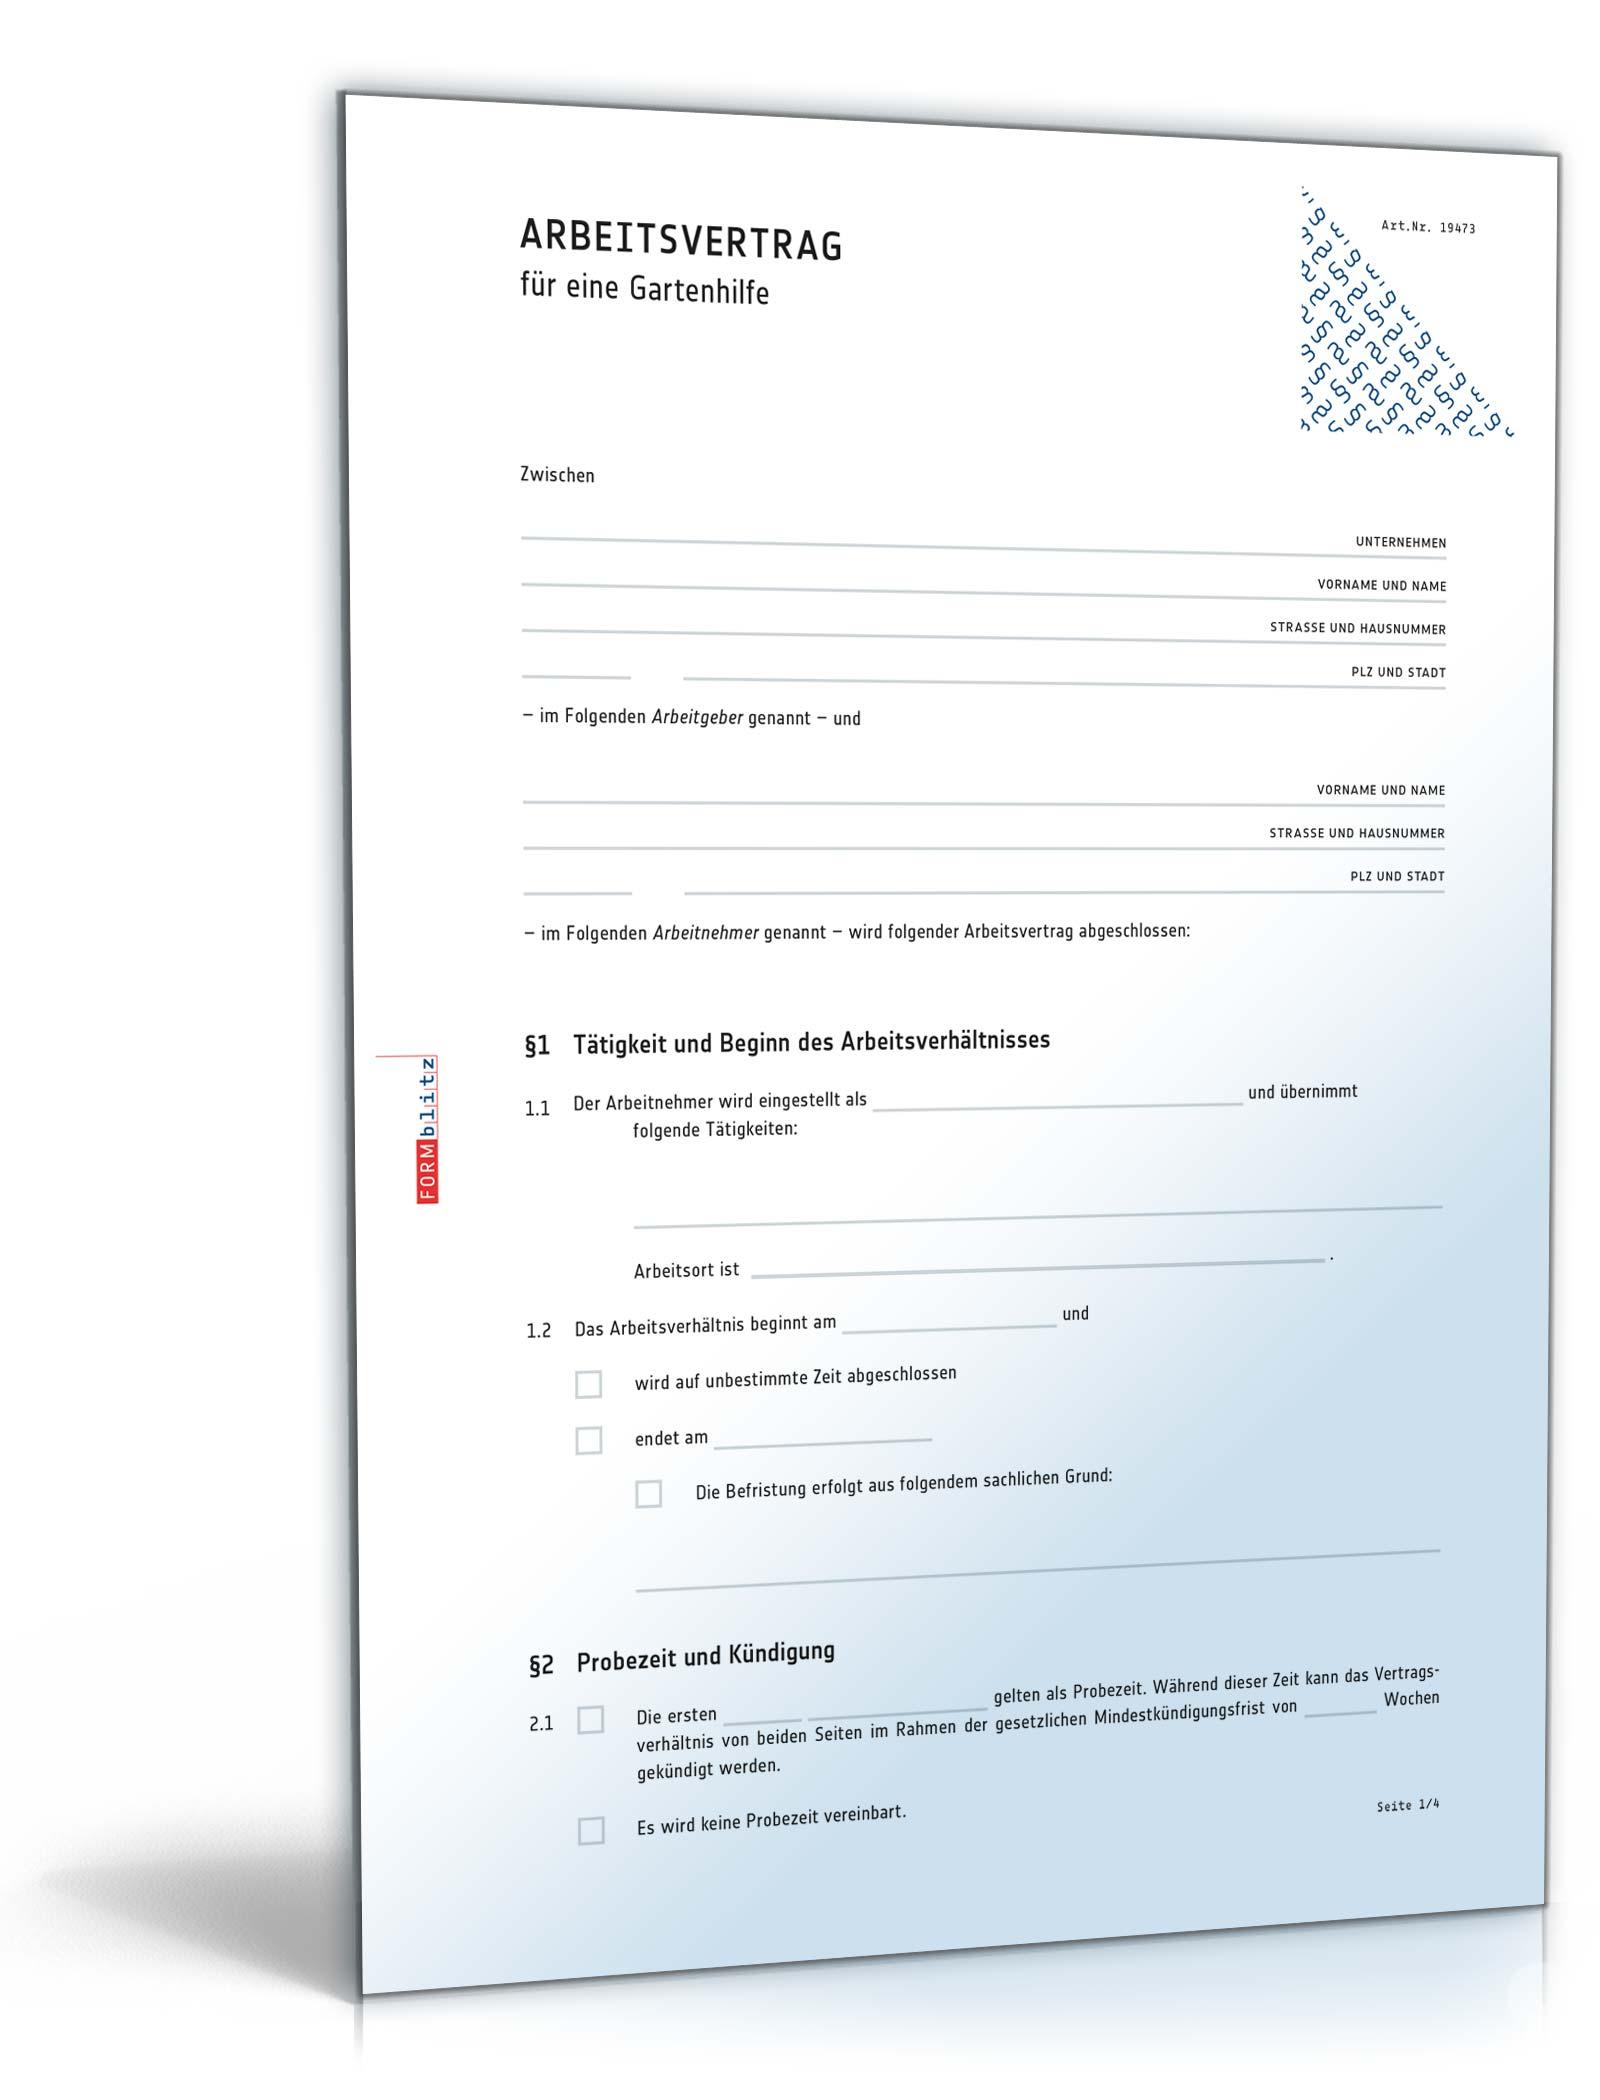 Arbeitsvertrag Gärtner Anwaltsgeprüftes Muster Zum Download